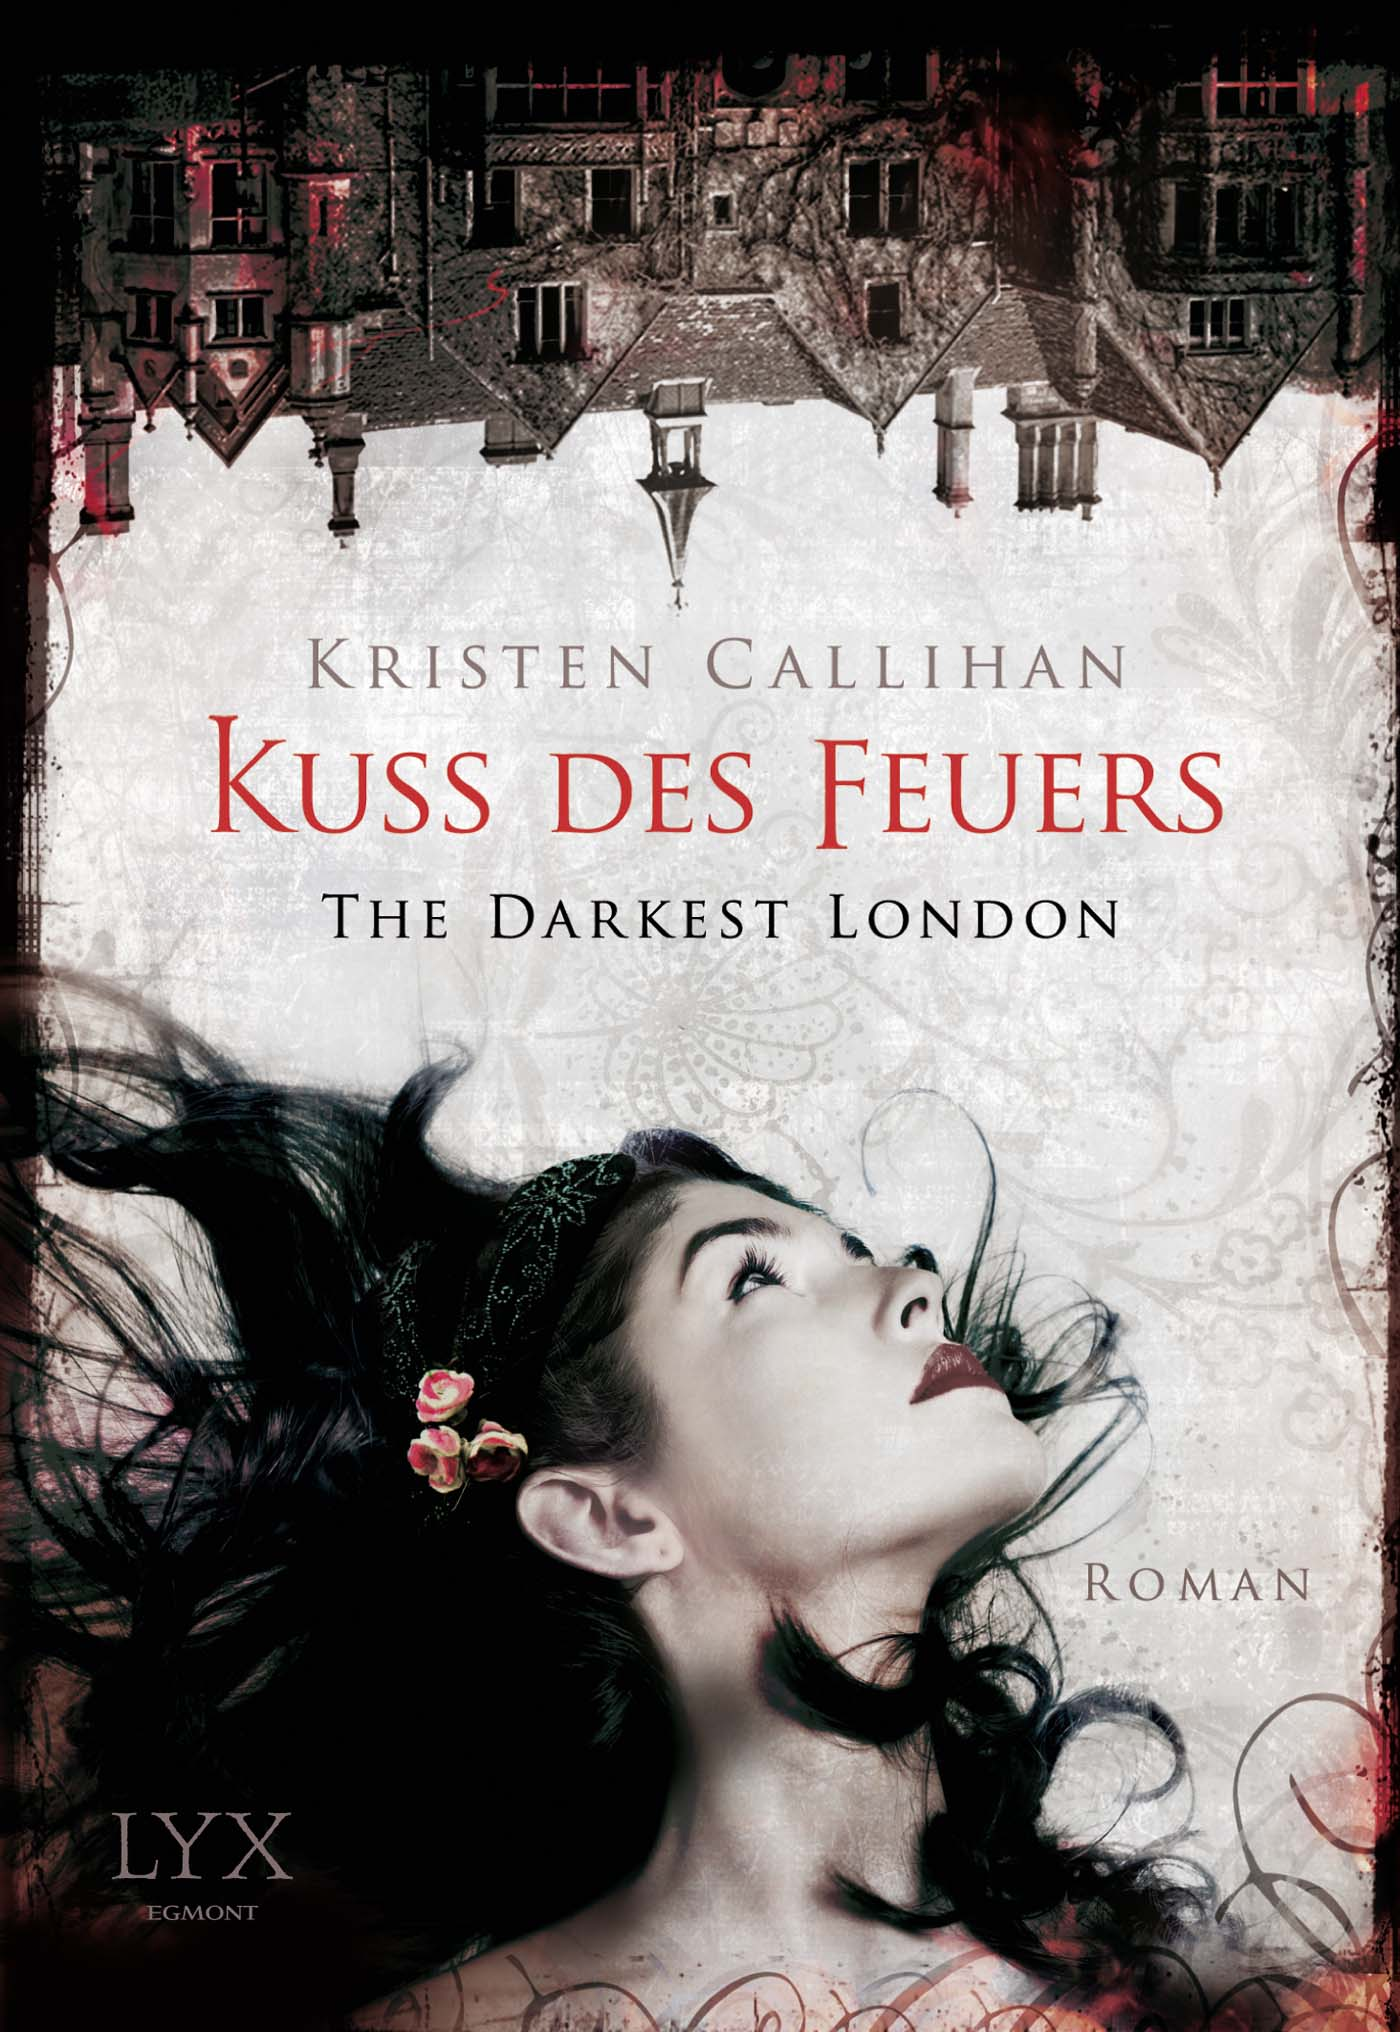 The Darkest London: Kuss des Feuers - Kristen Callihan